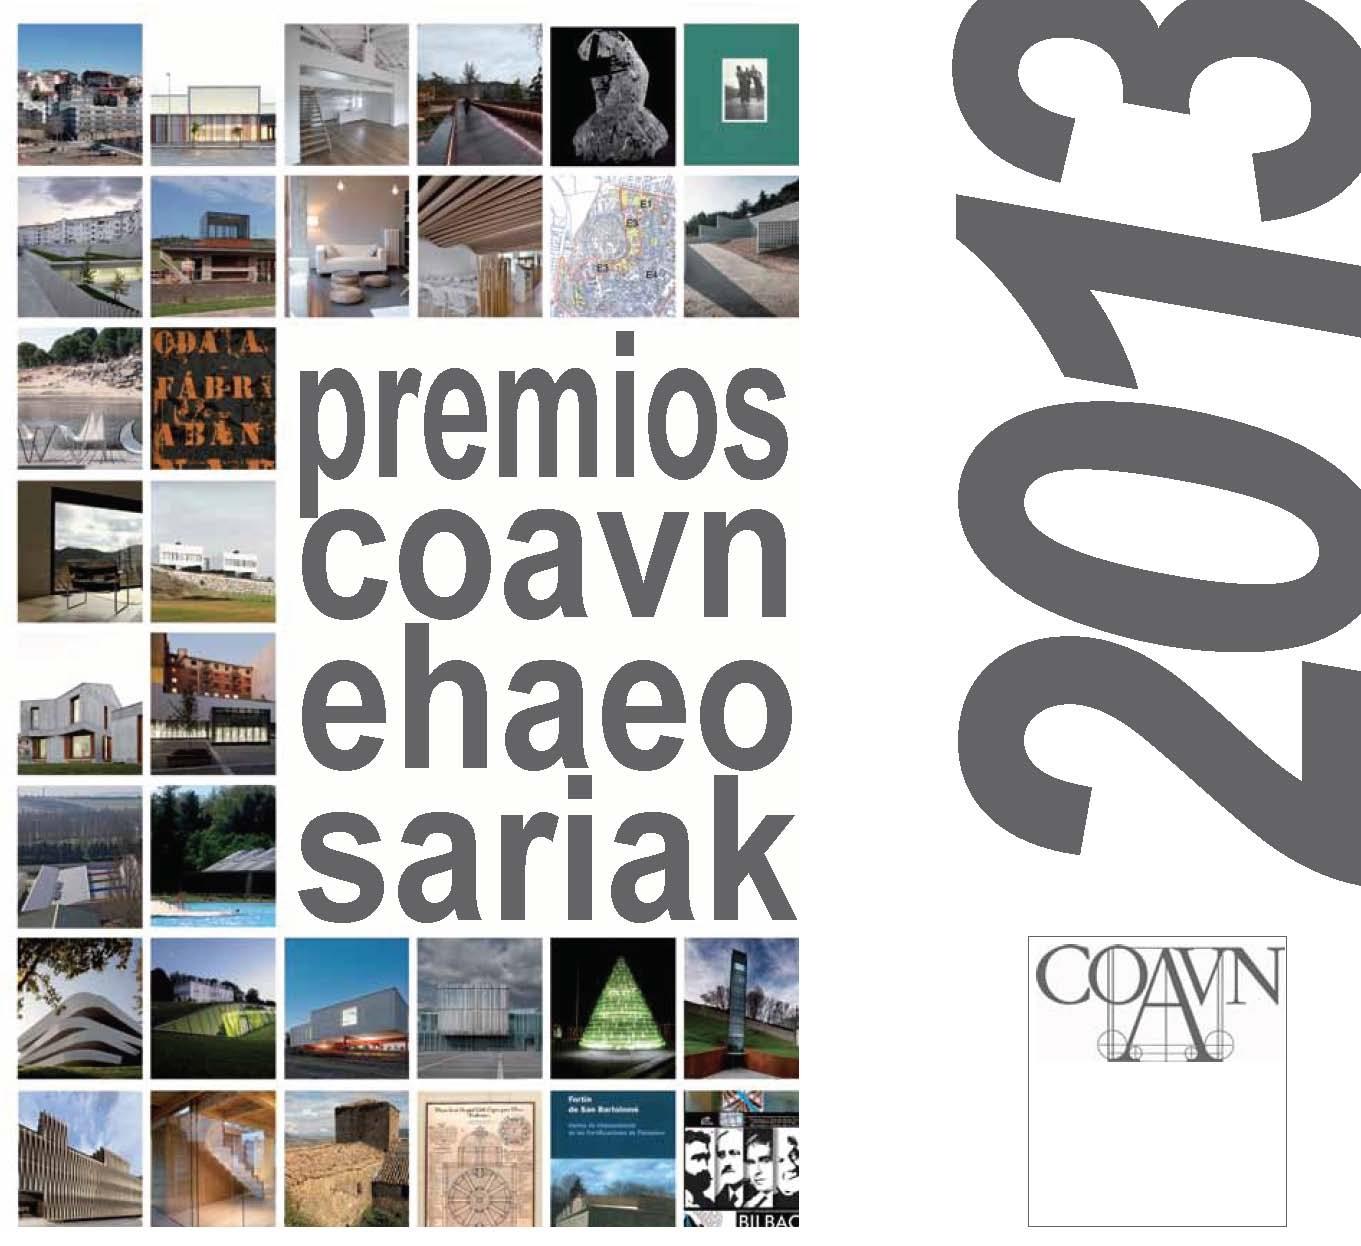 Premios COAVN 2013